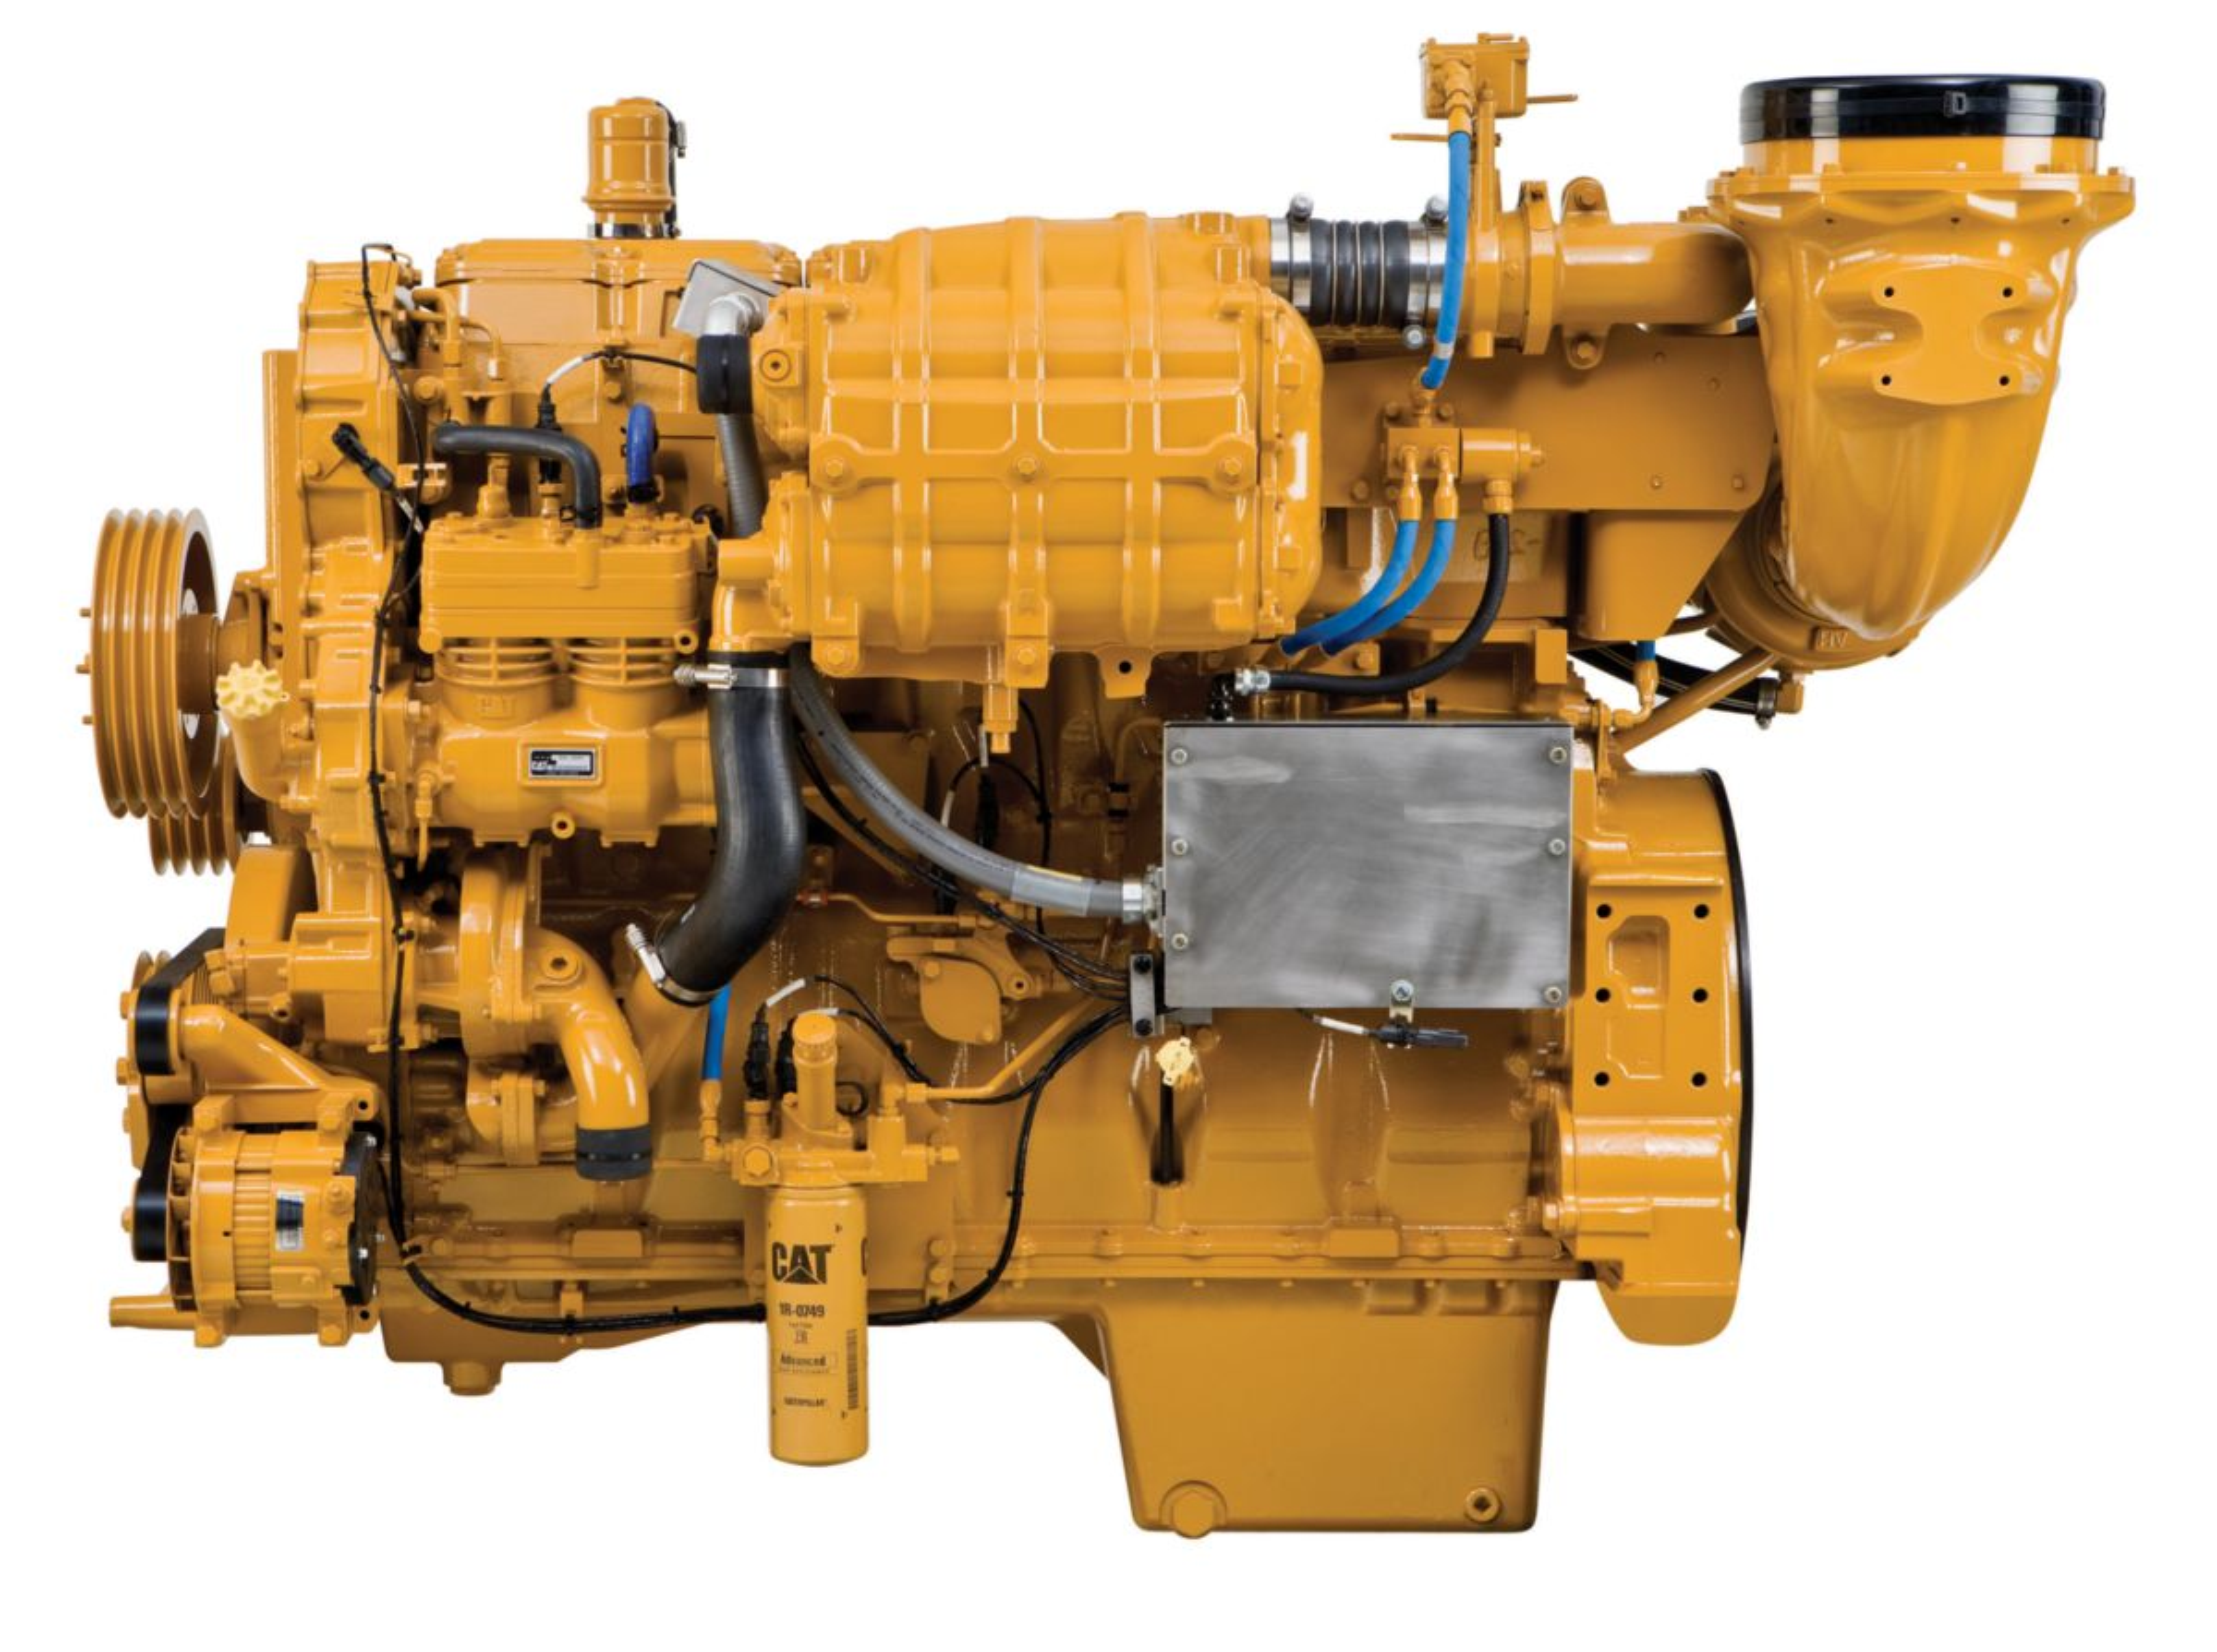 C15 ACERT™ Hazardous Location Engine